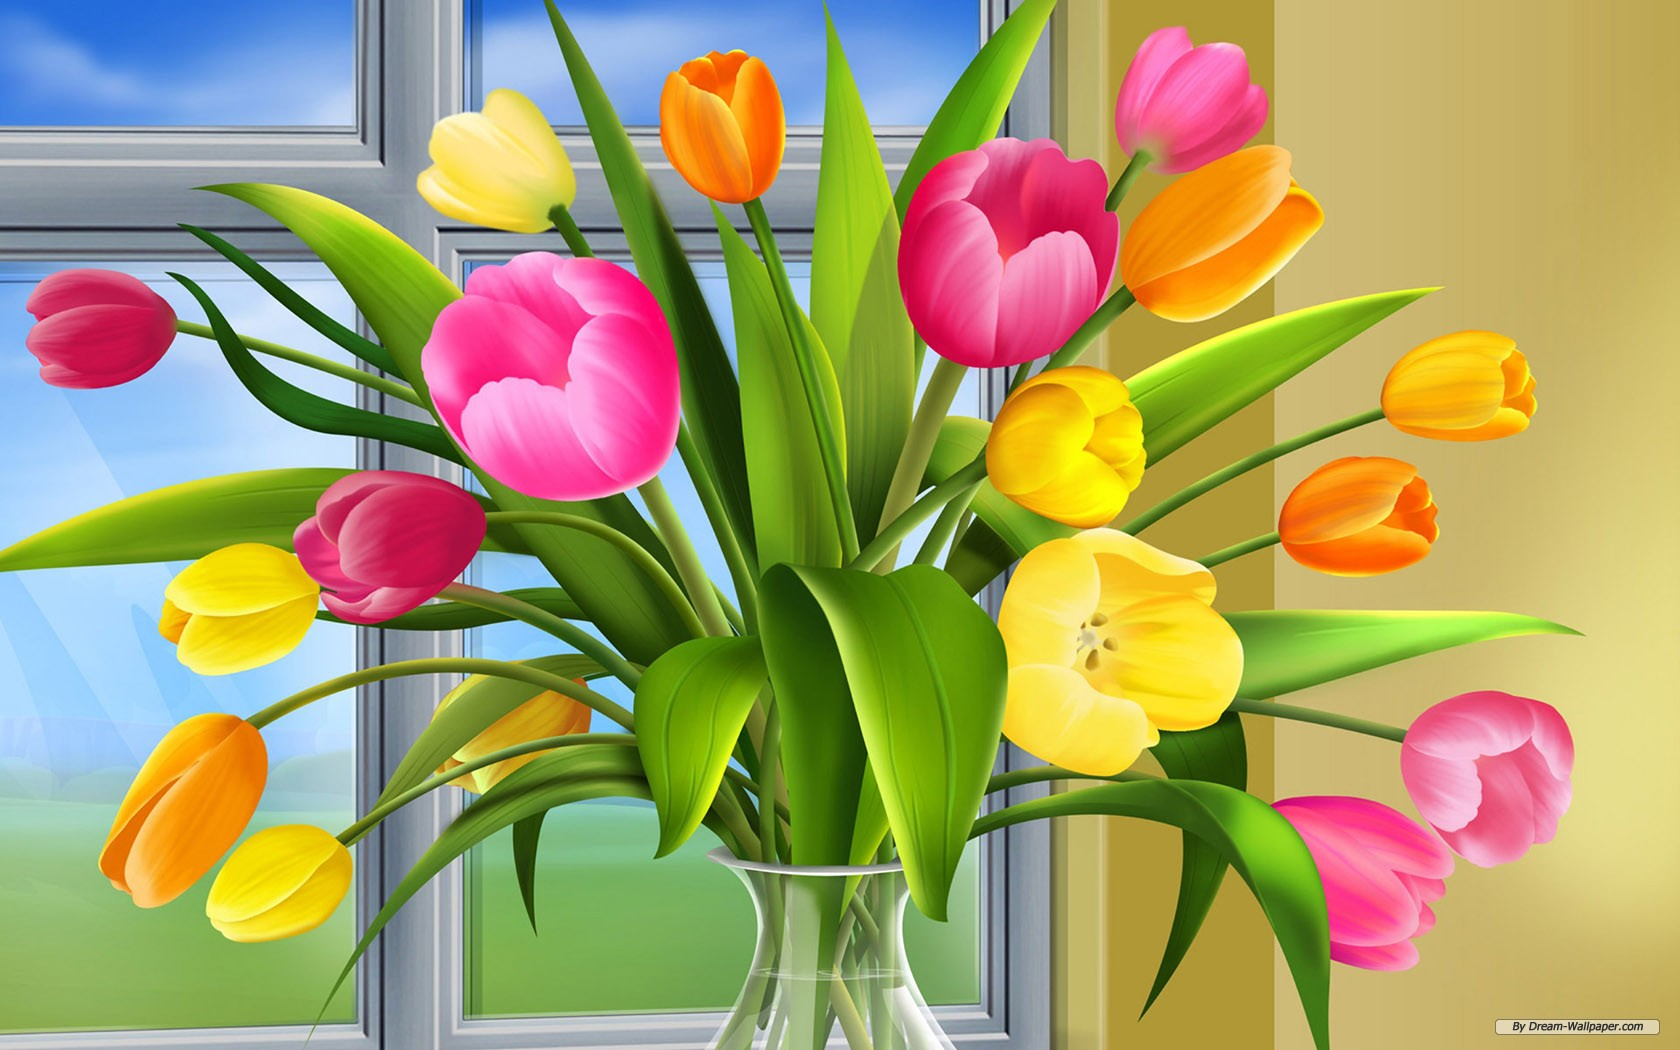 Spring Desktop Wallpaper Screensaver image 1680x1050